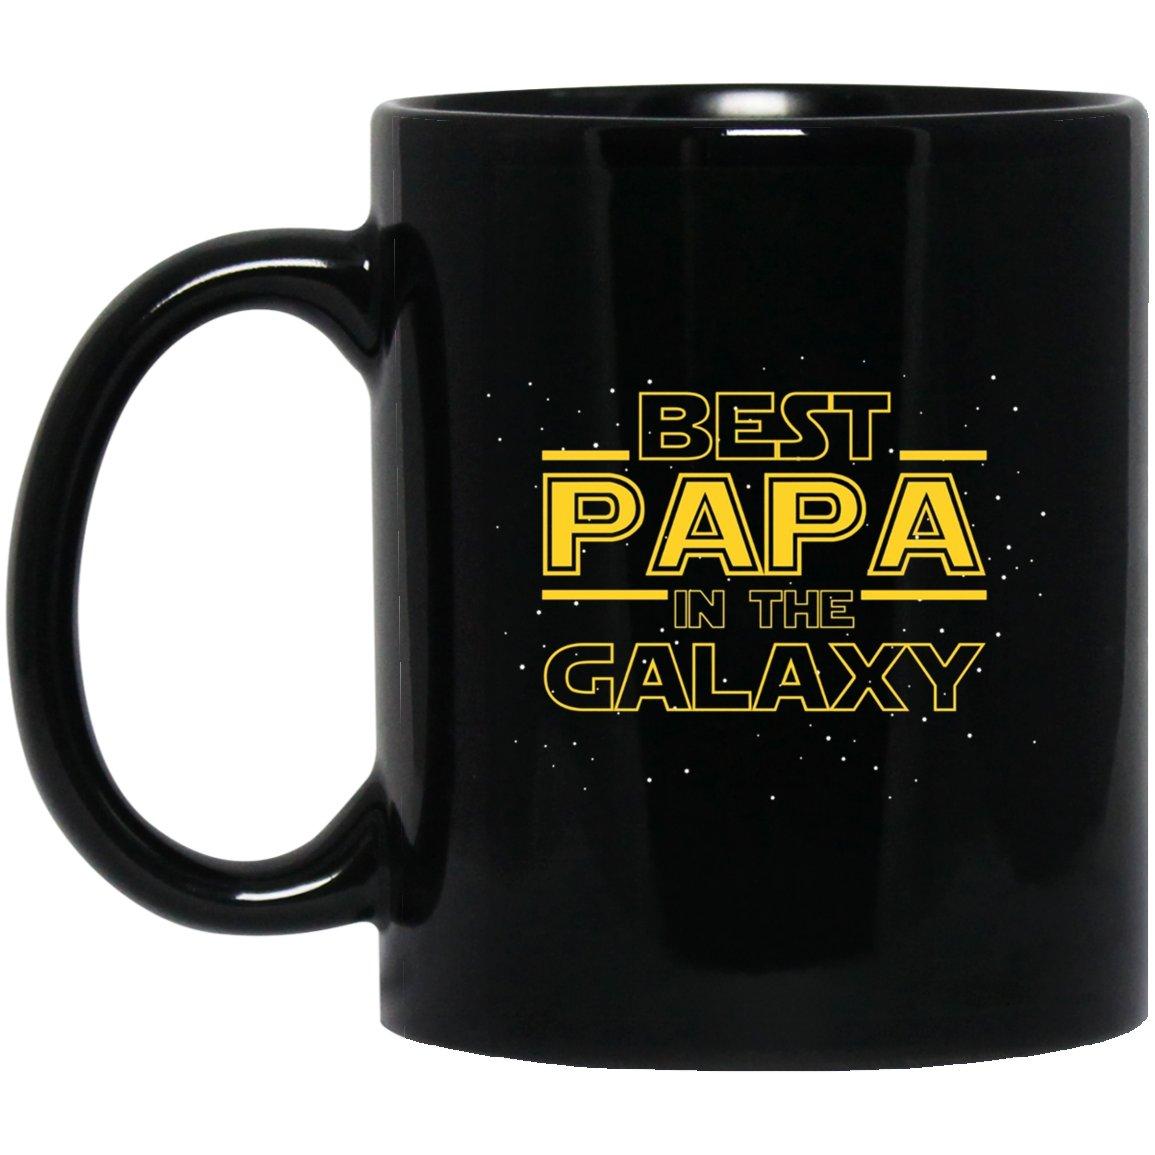 Mens Best Papa in the Galaxy, Funny Papa Gift Black  Mug Black Ceramic 11oz Coffee Tea Cup